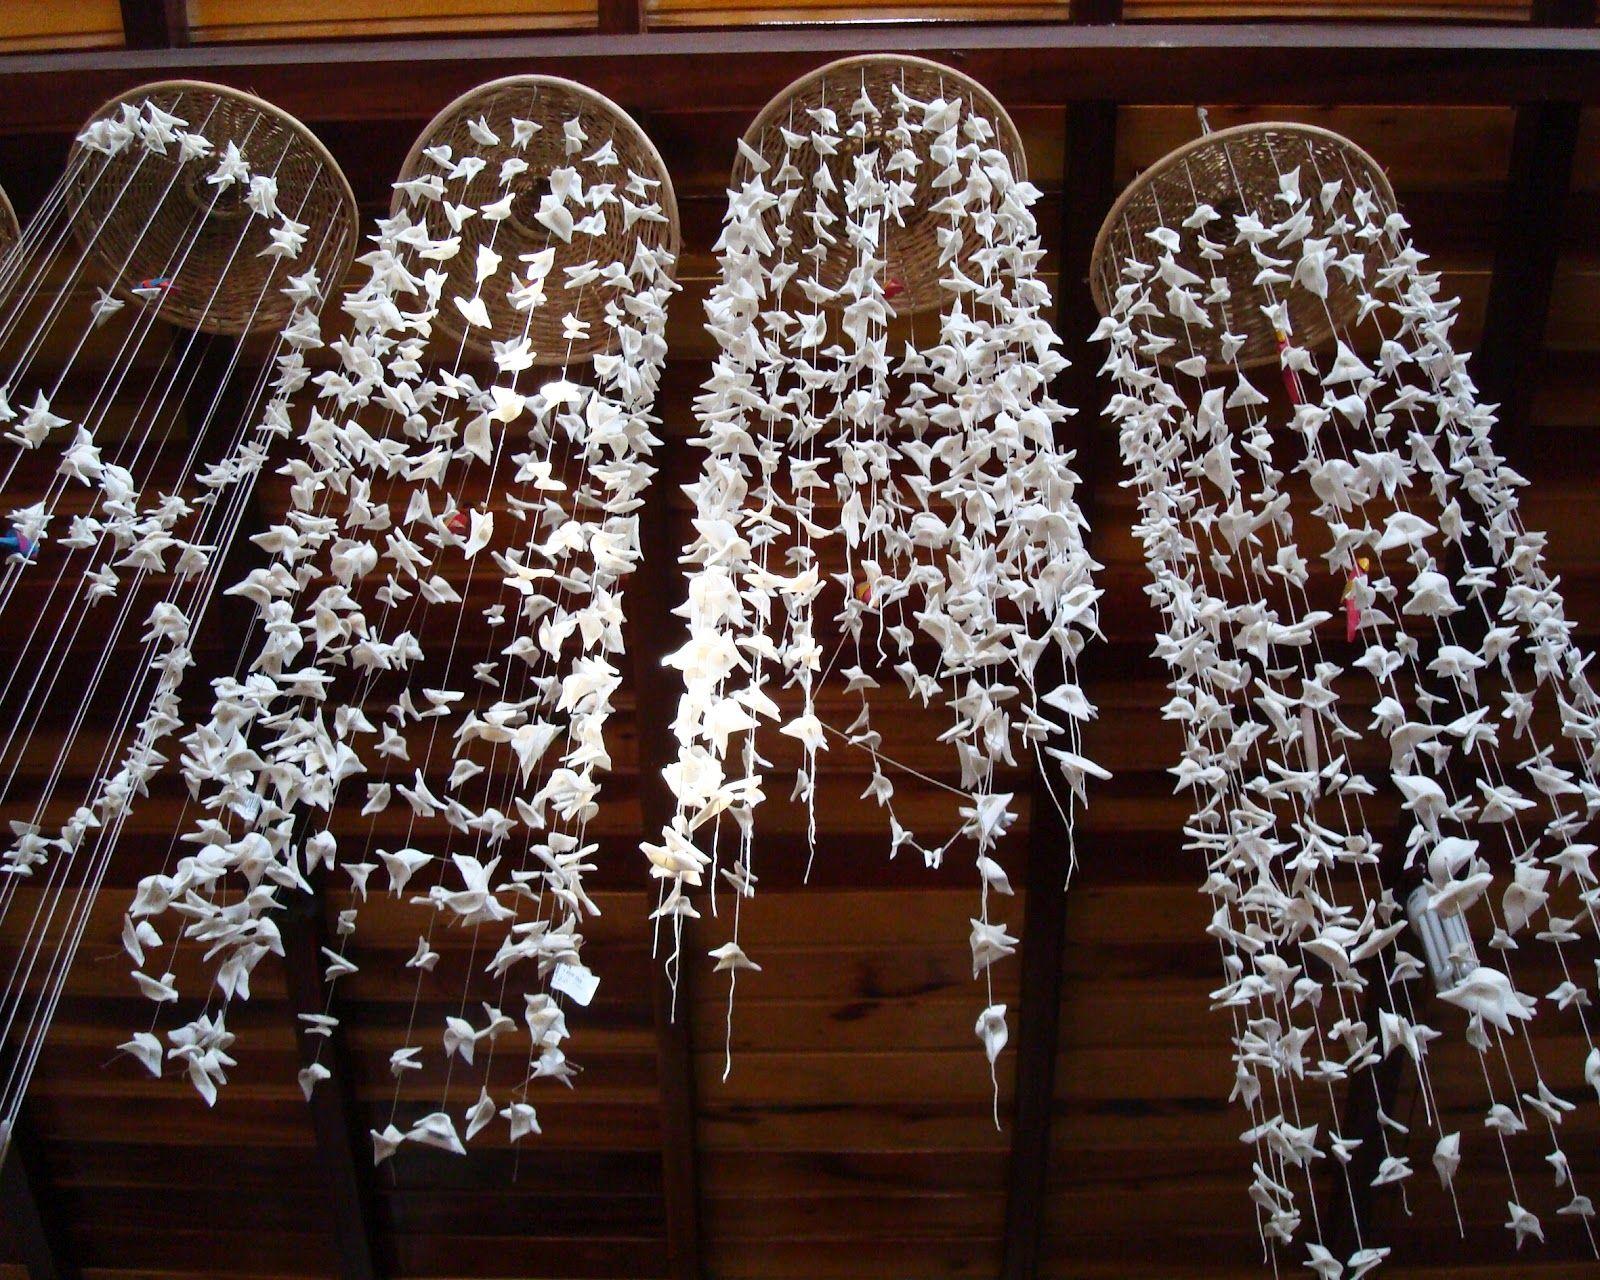 Seashell crafts little world brazil arts and crafts for Arts and crafts with seashells